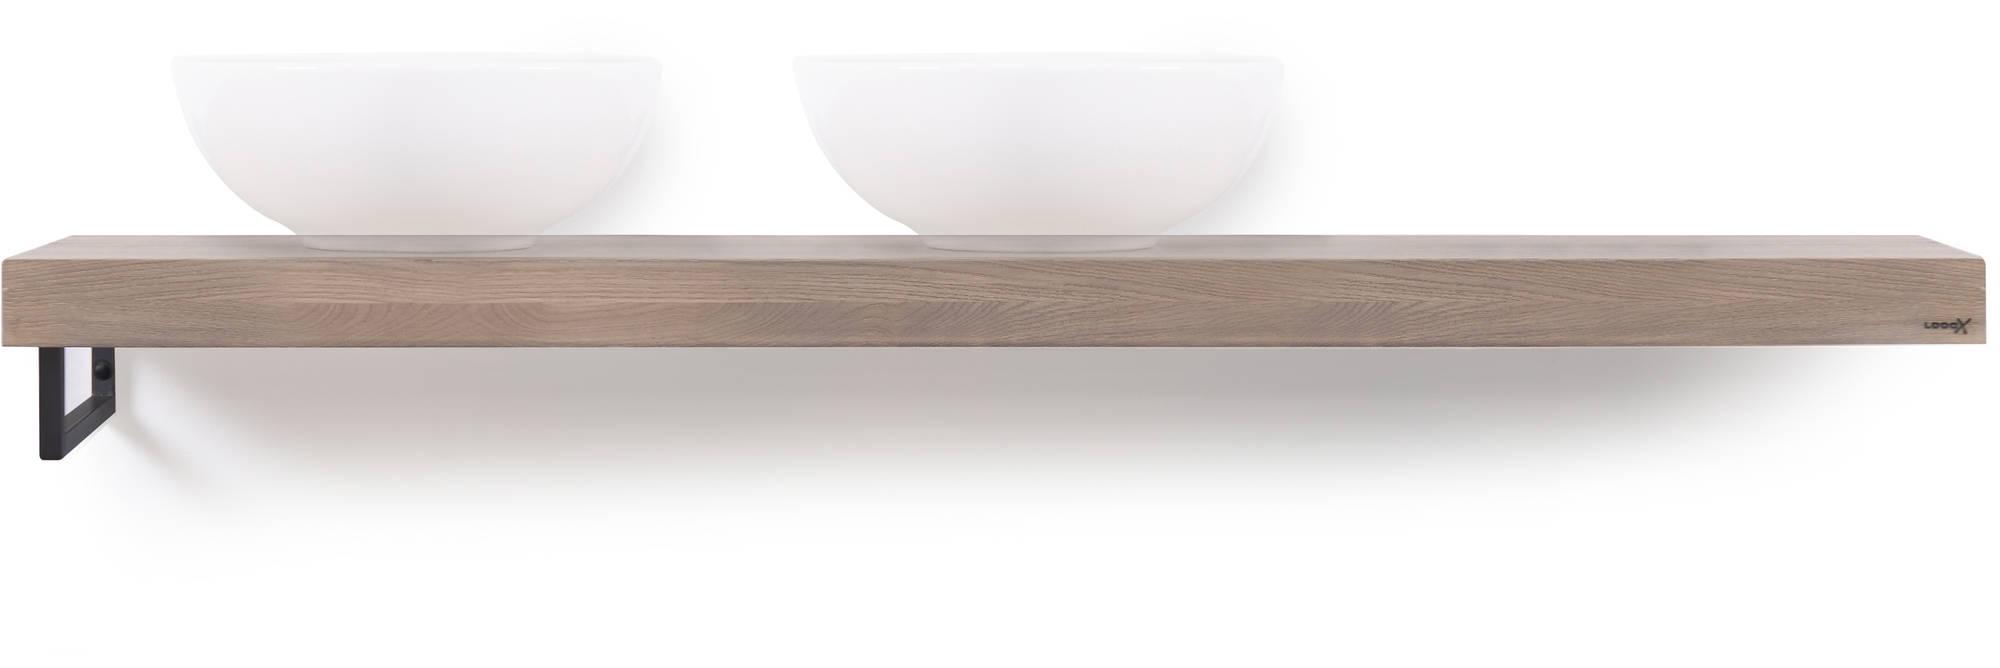 Looox Wooden Base Shelf Solo 160 cm Houder Links Old Grey/Mat Zwart